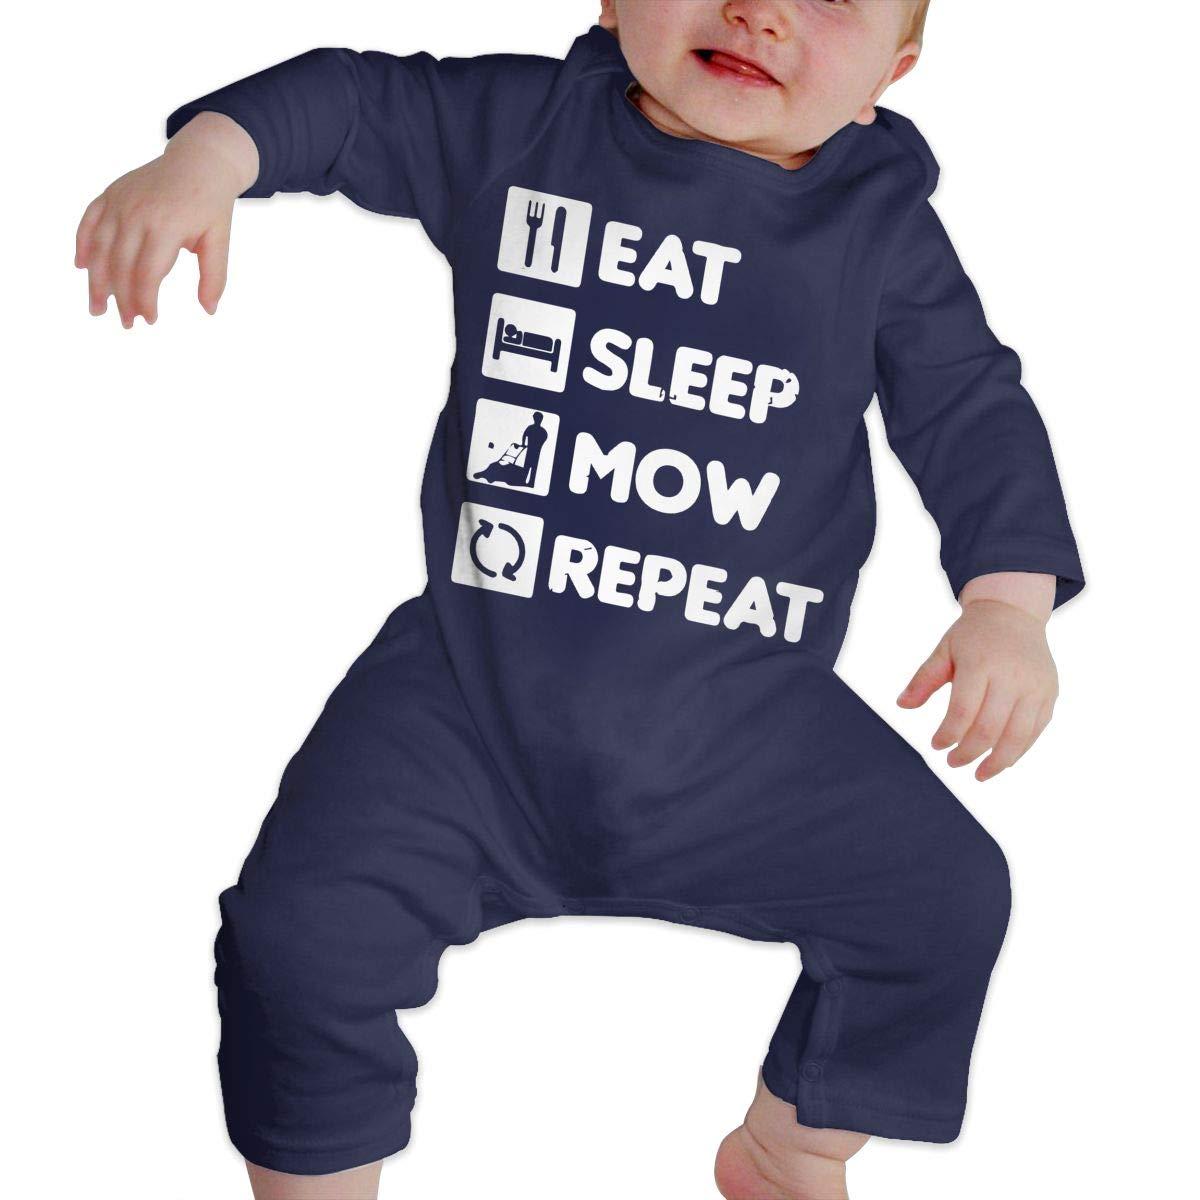 LBJQ8 Eat Sleep Mow Repeat Toddler Baby Girls Long Sleeve Romper Jumpsuit Bodysuit